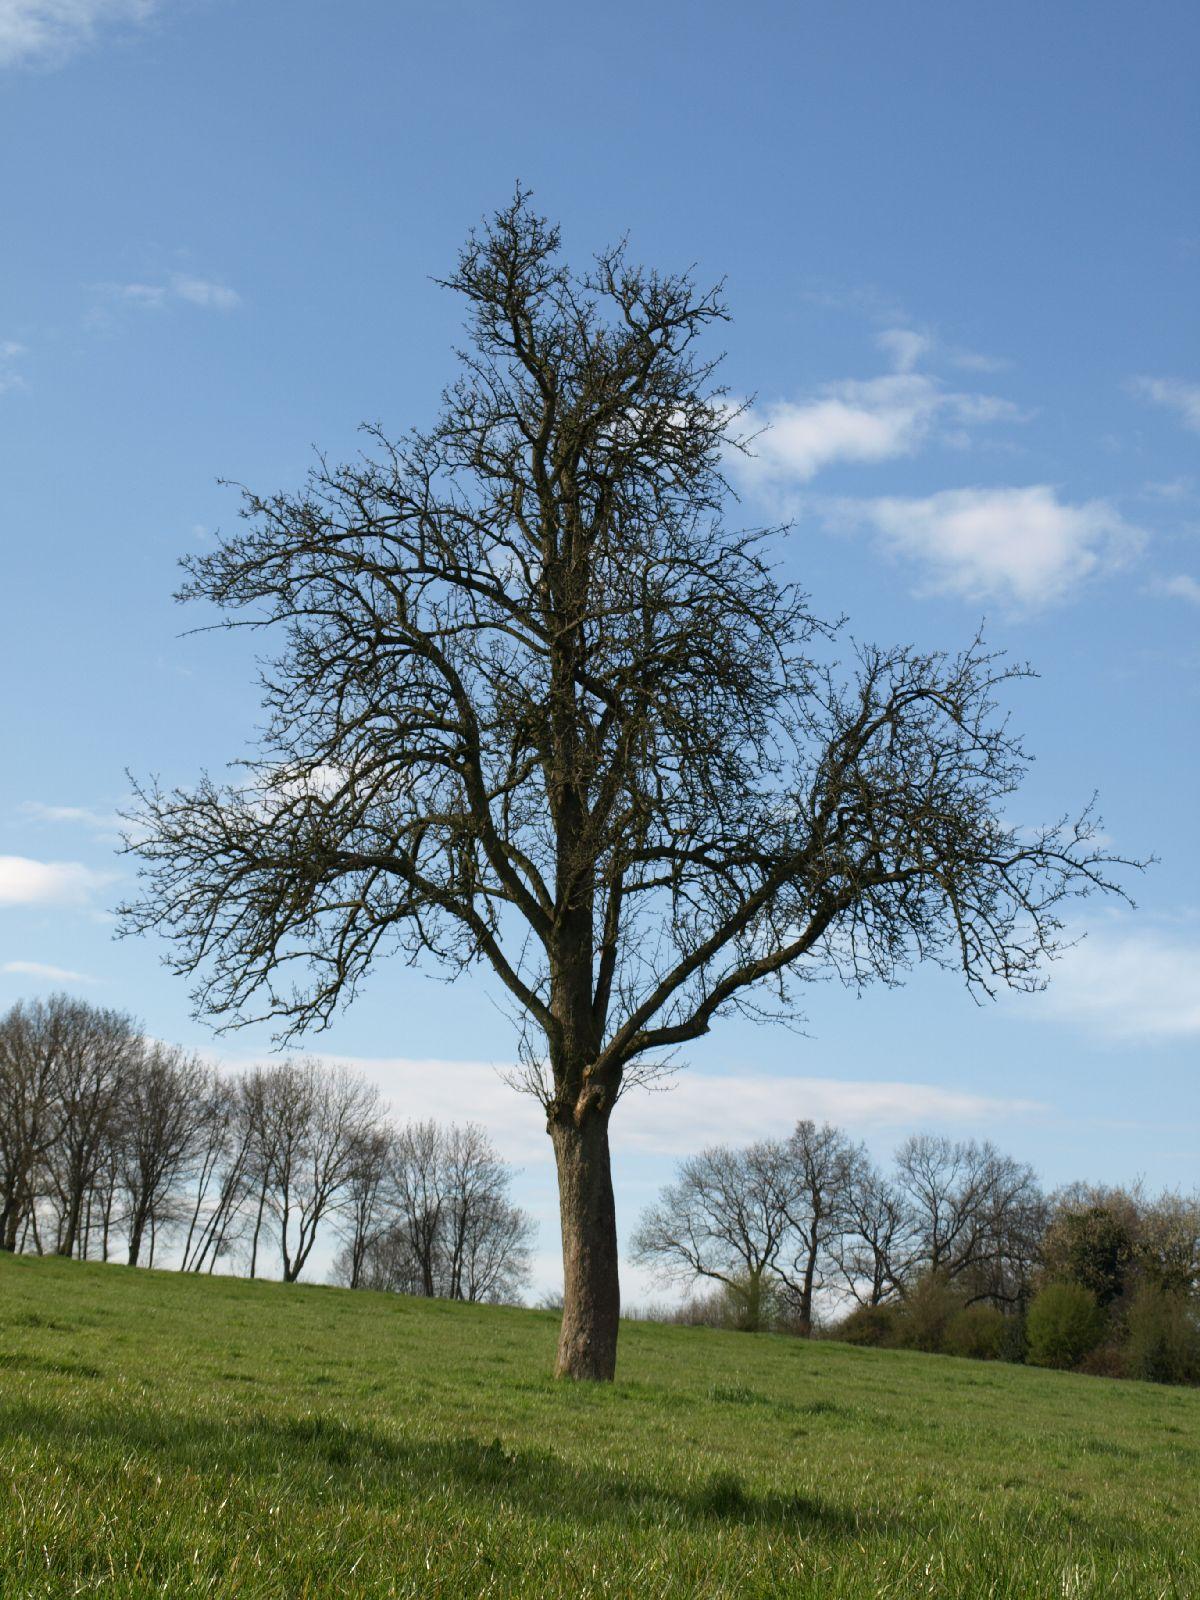 Pflanzen-Baum-Silhouette-Foto_Textur_B_P4201549